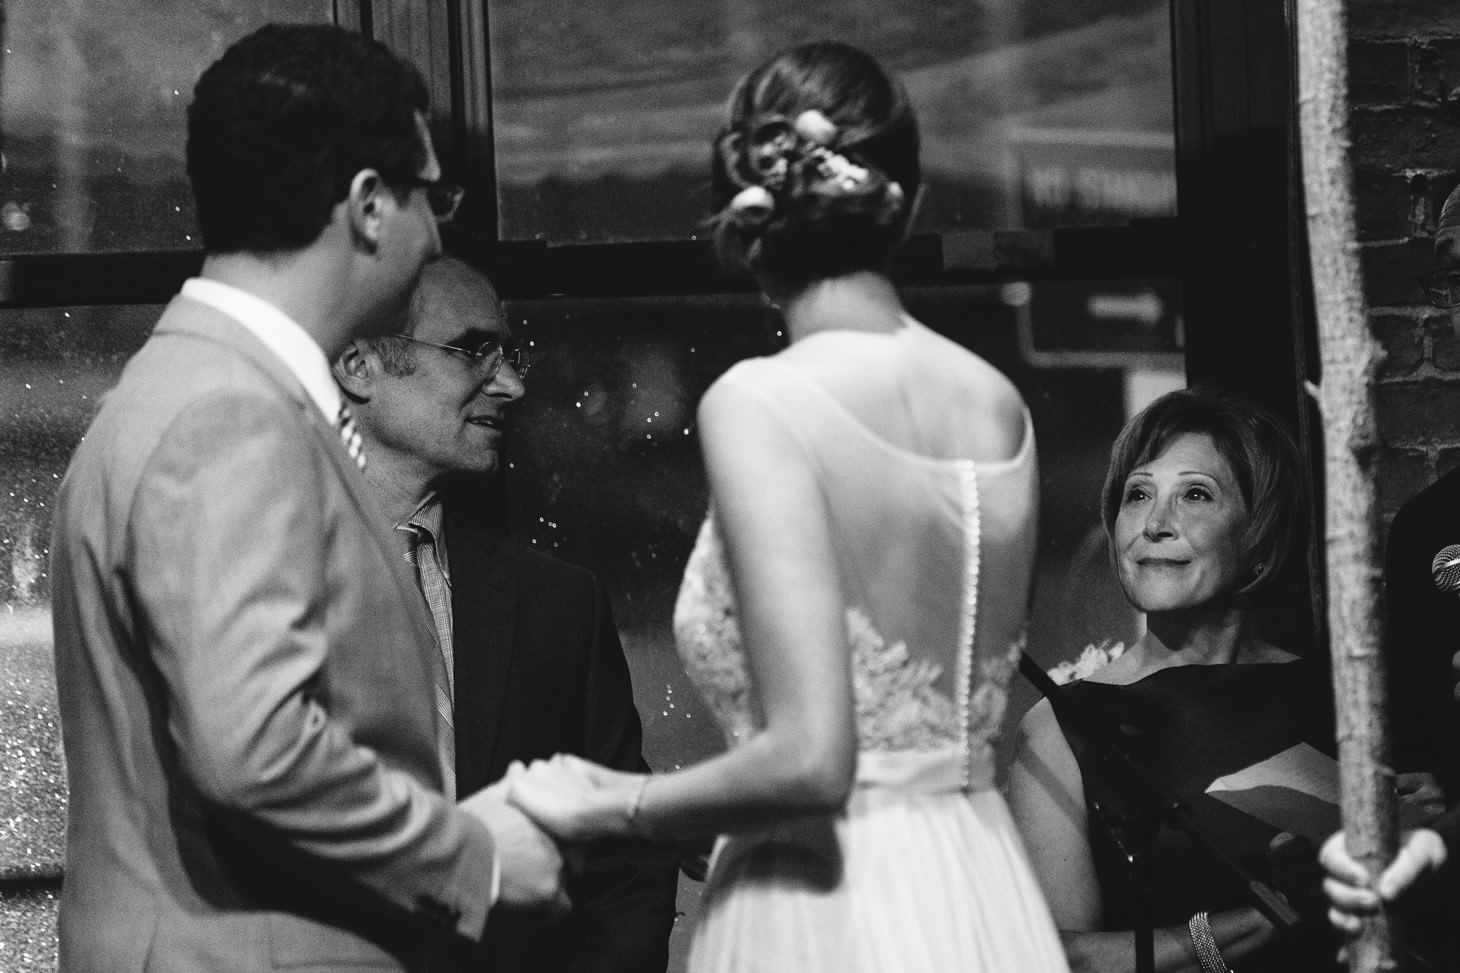 021-nyc-dumbo-loft-brooklyn-wedding-photographer-smitten-chickens-photo-.jpg